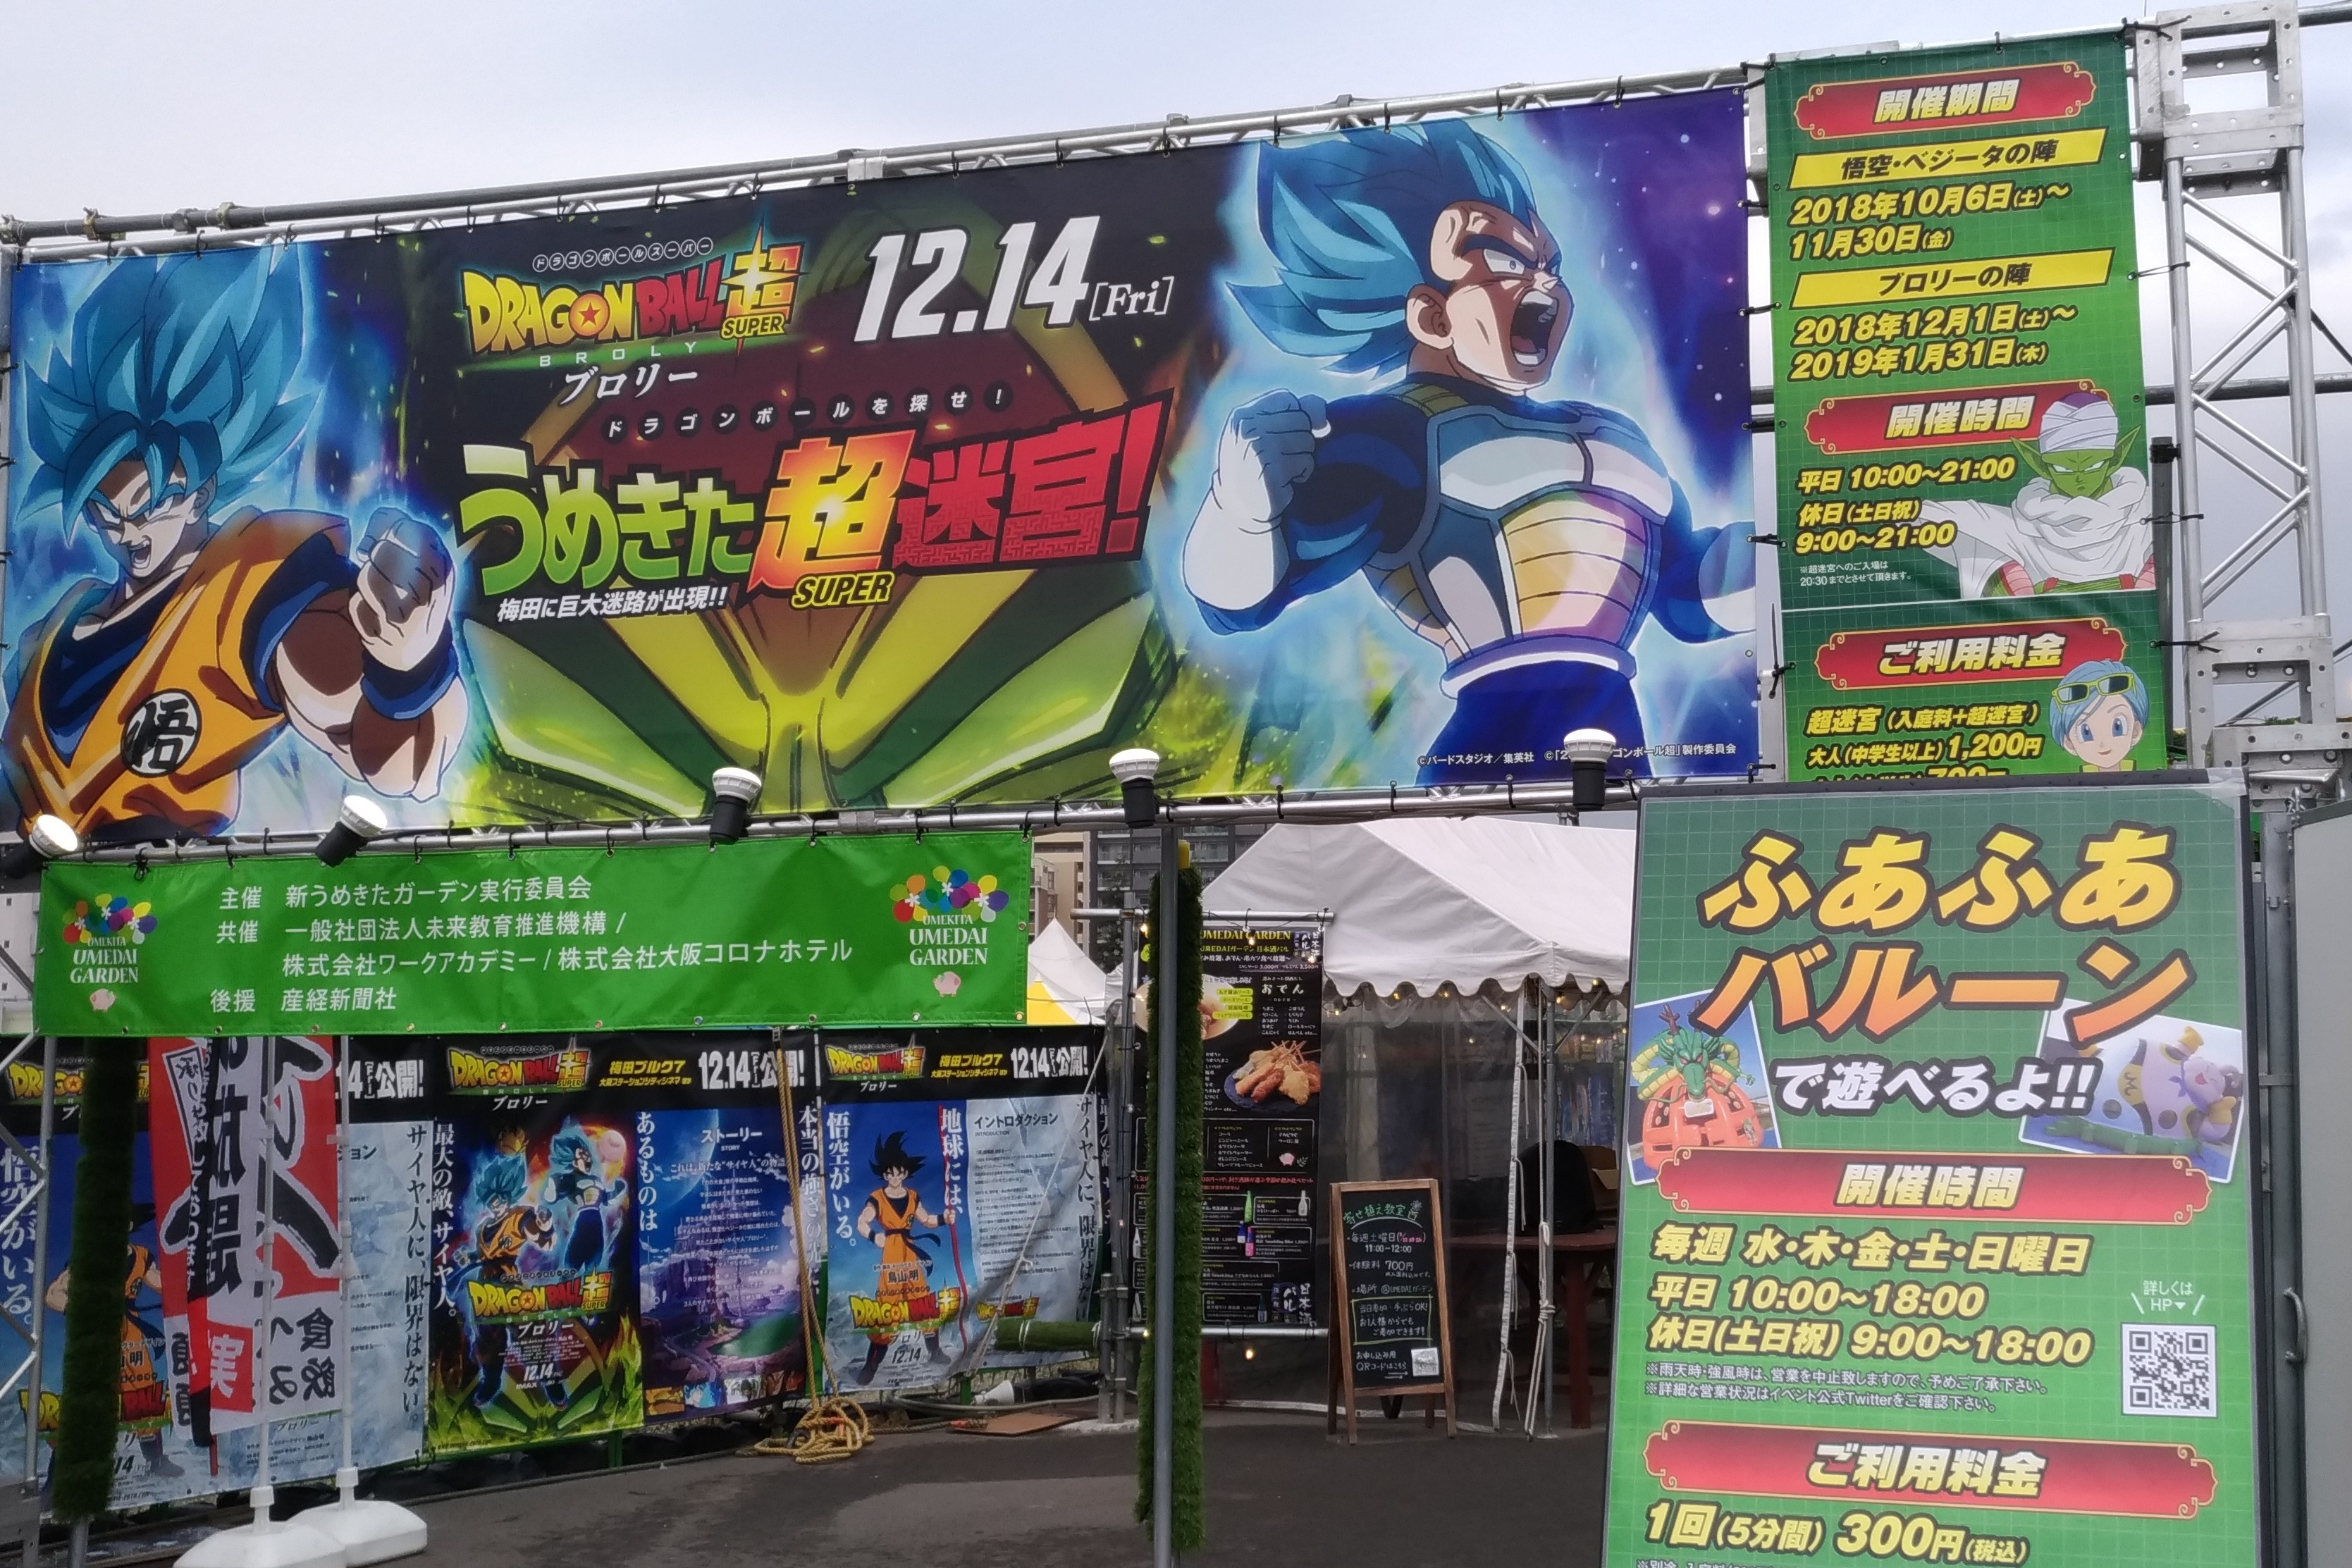 osaka_umeda_dragonball_super2.jpg